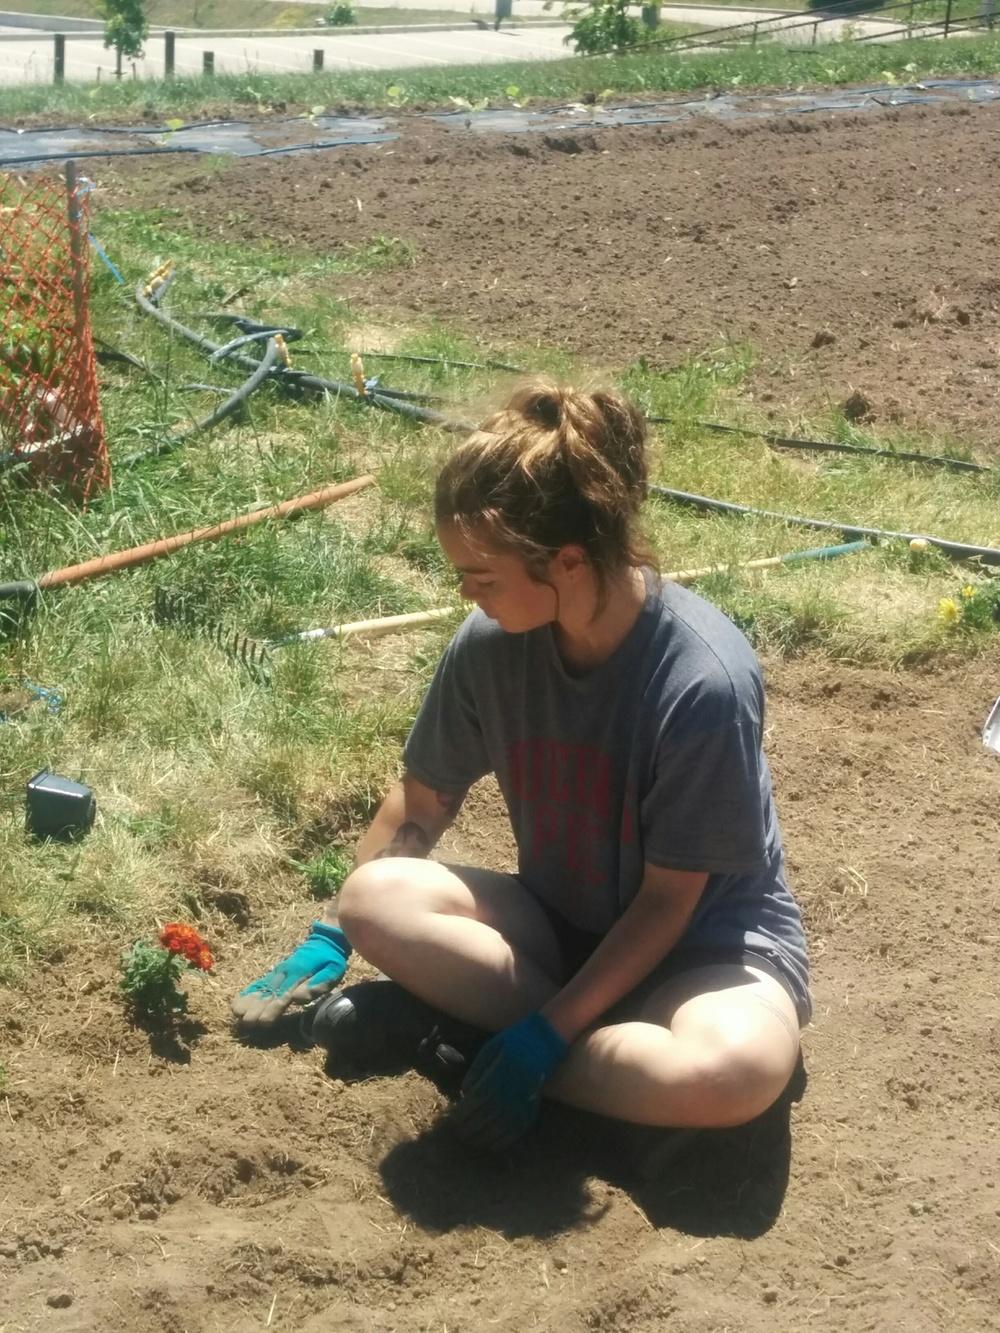 062216_Jessie Planting Marigolds.jpg